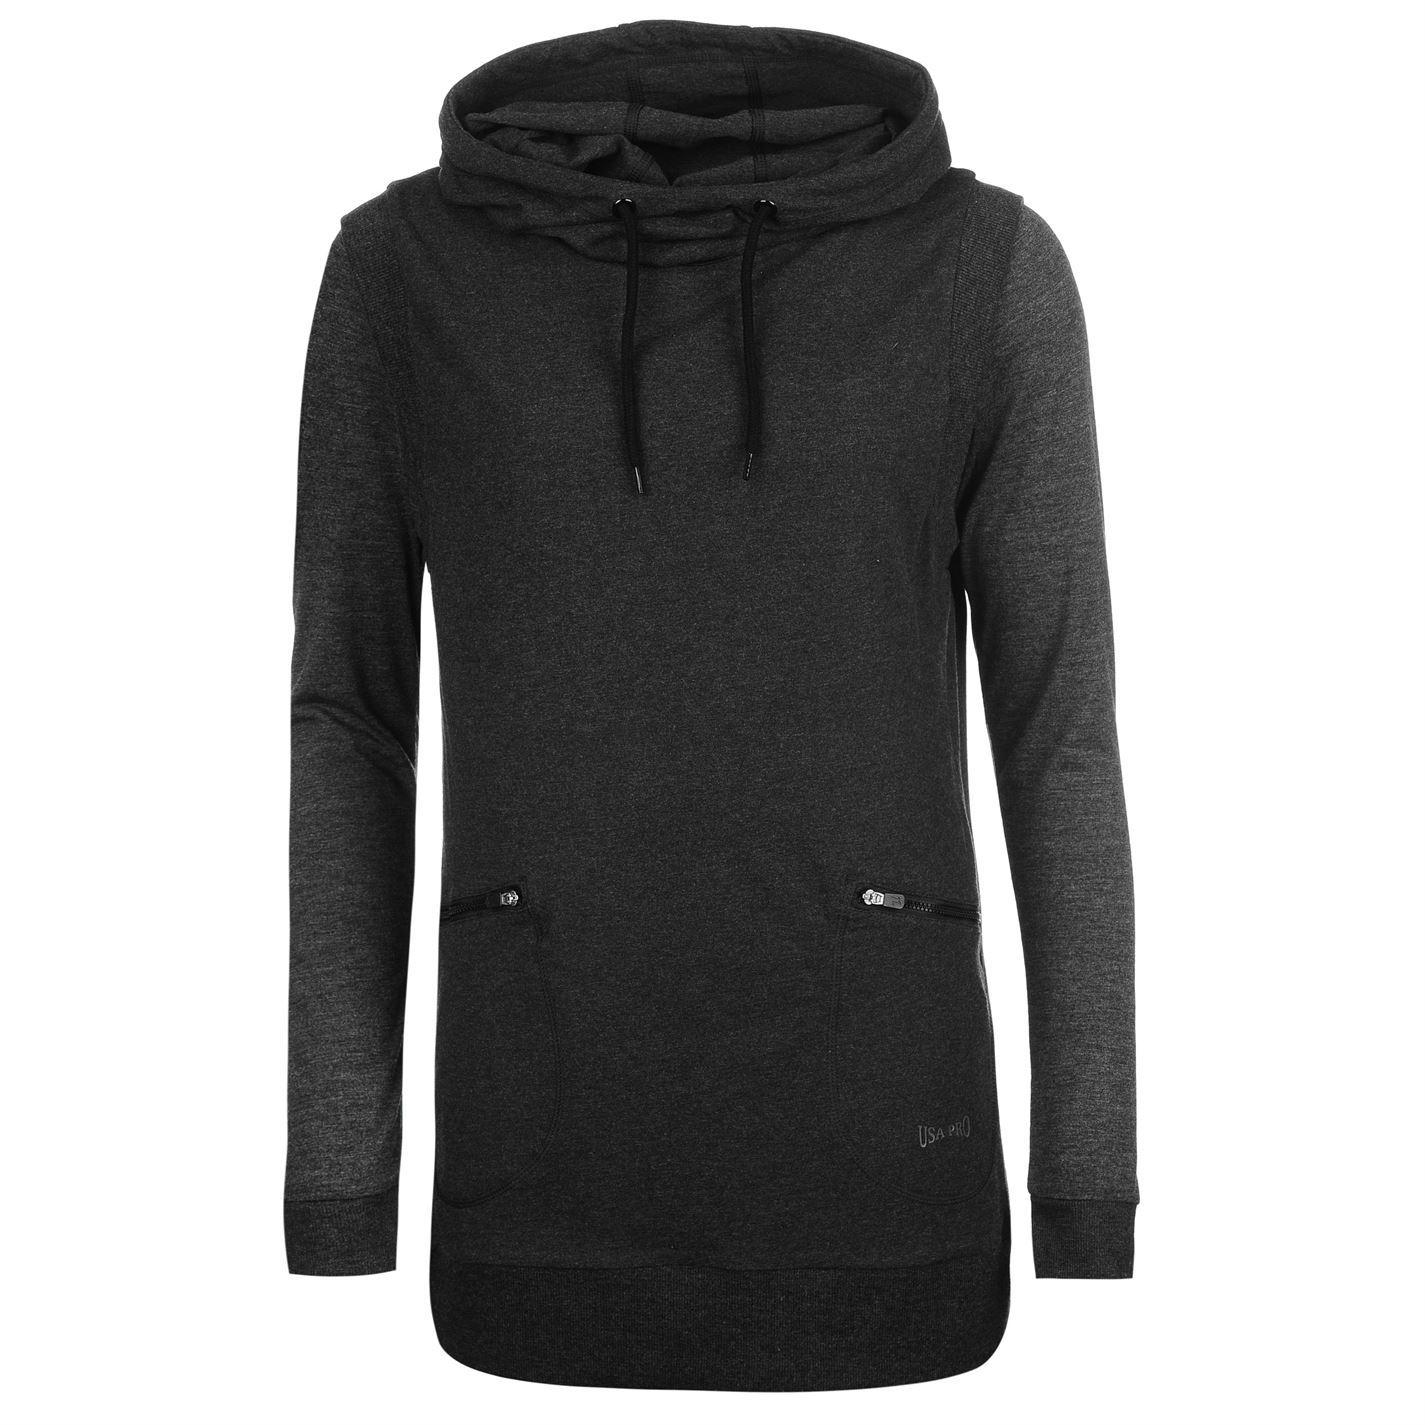 USA-Pro-Womens-D-Layer-Hoodie-Hoody-Hooded-Top-Long-Sleeve-Drawstring